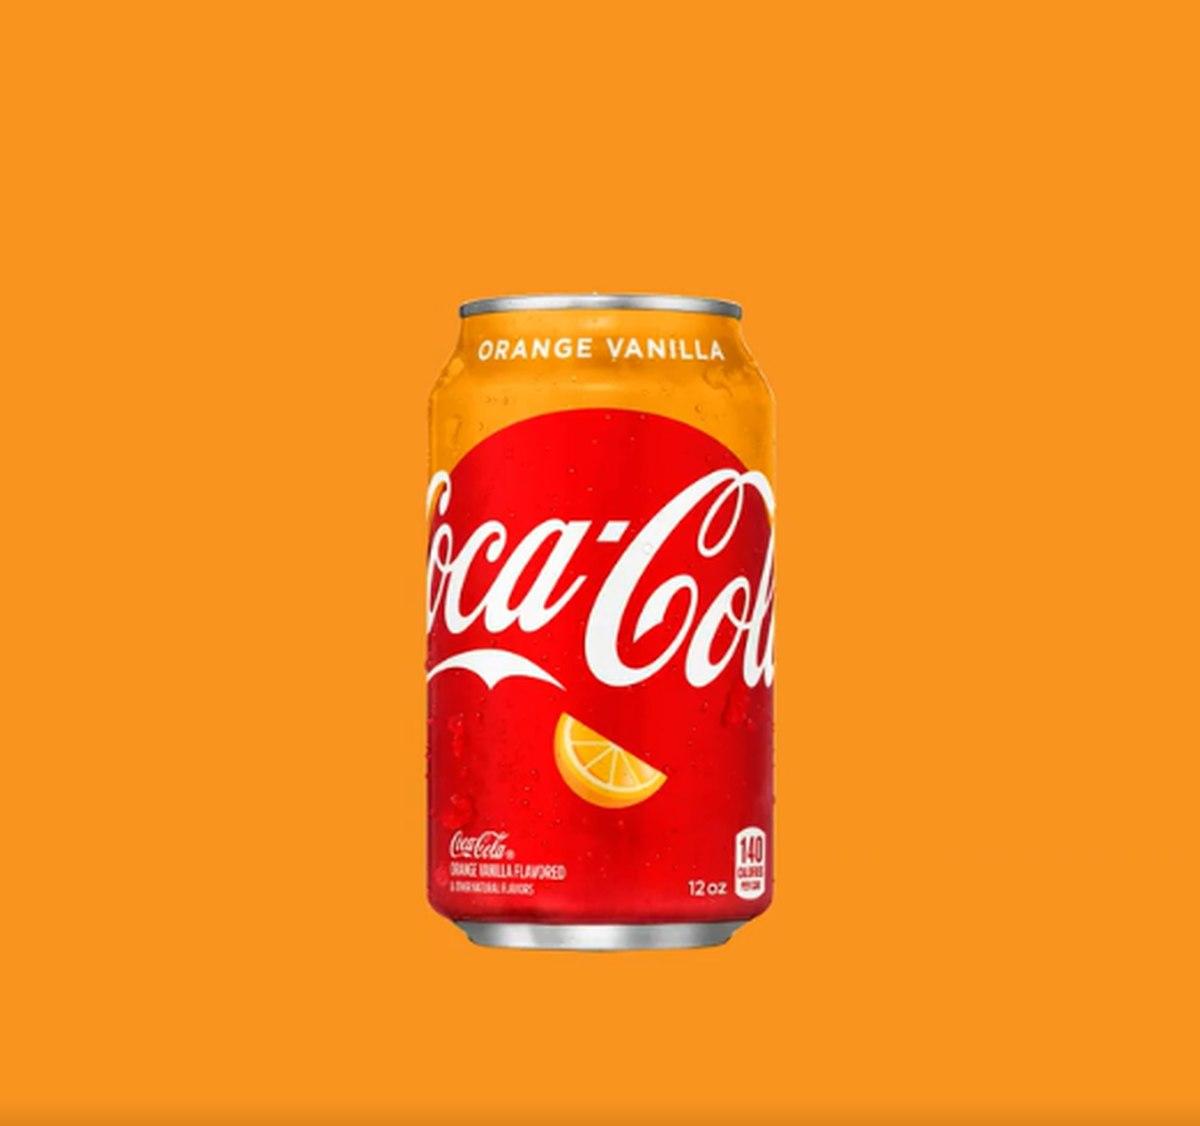 Coca-cola Reveals New Flavor photo